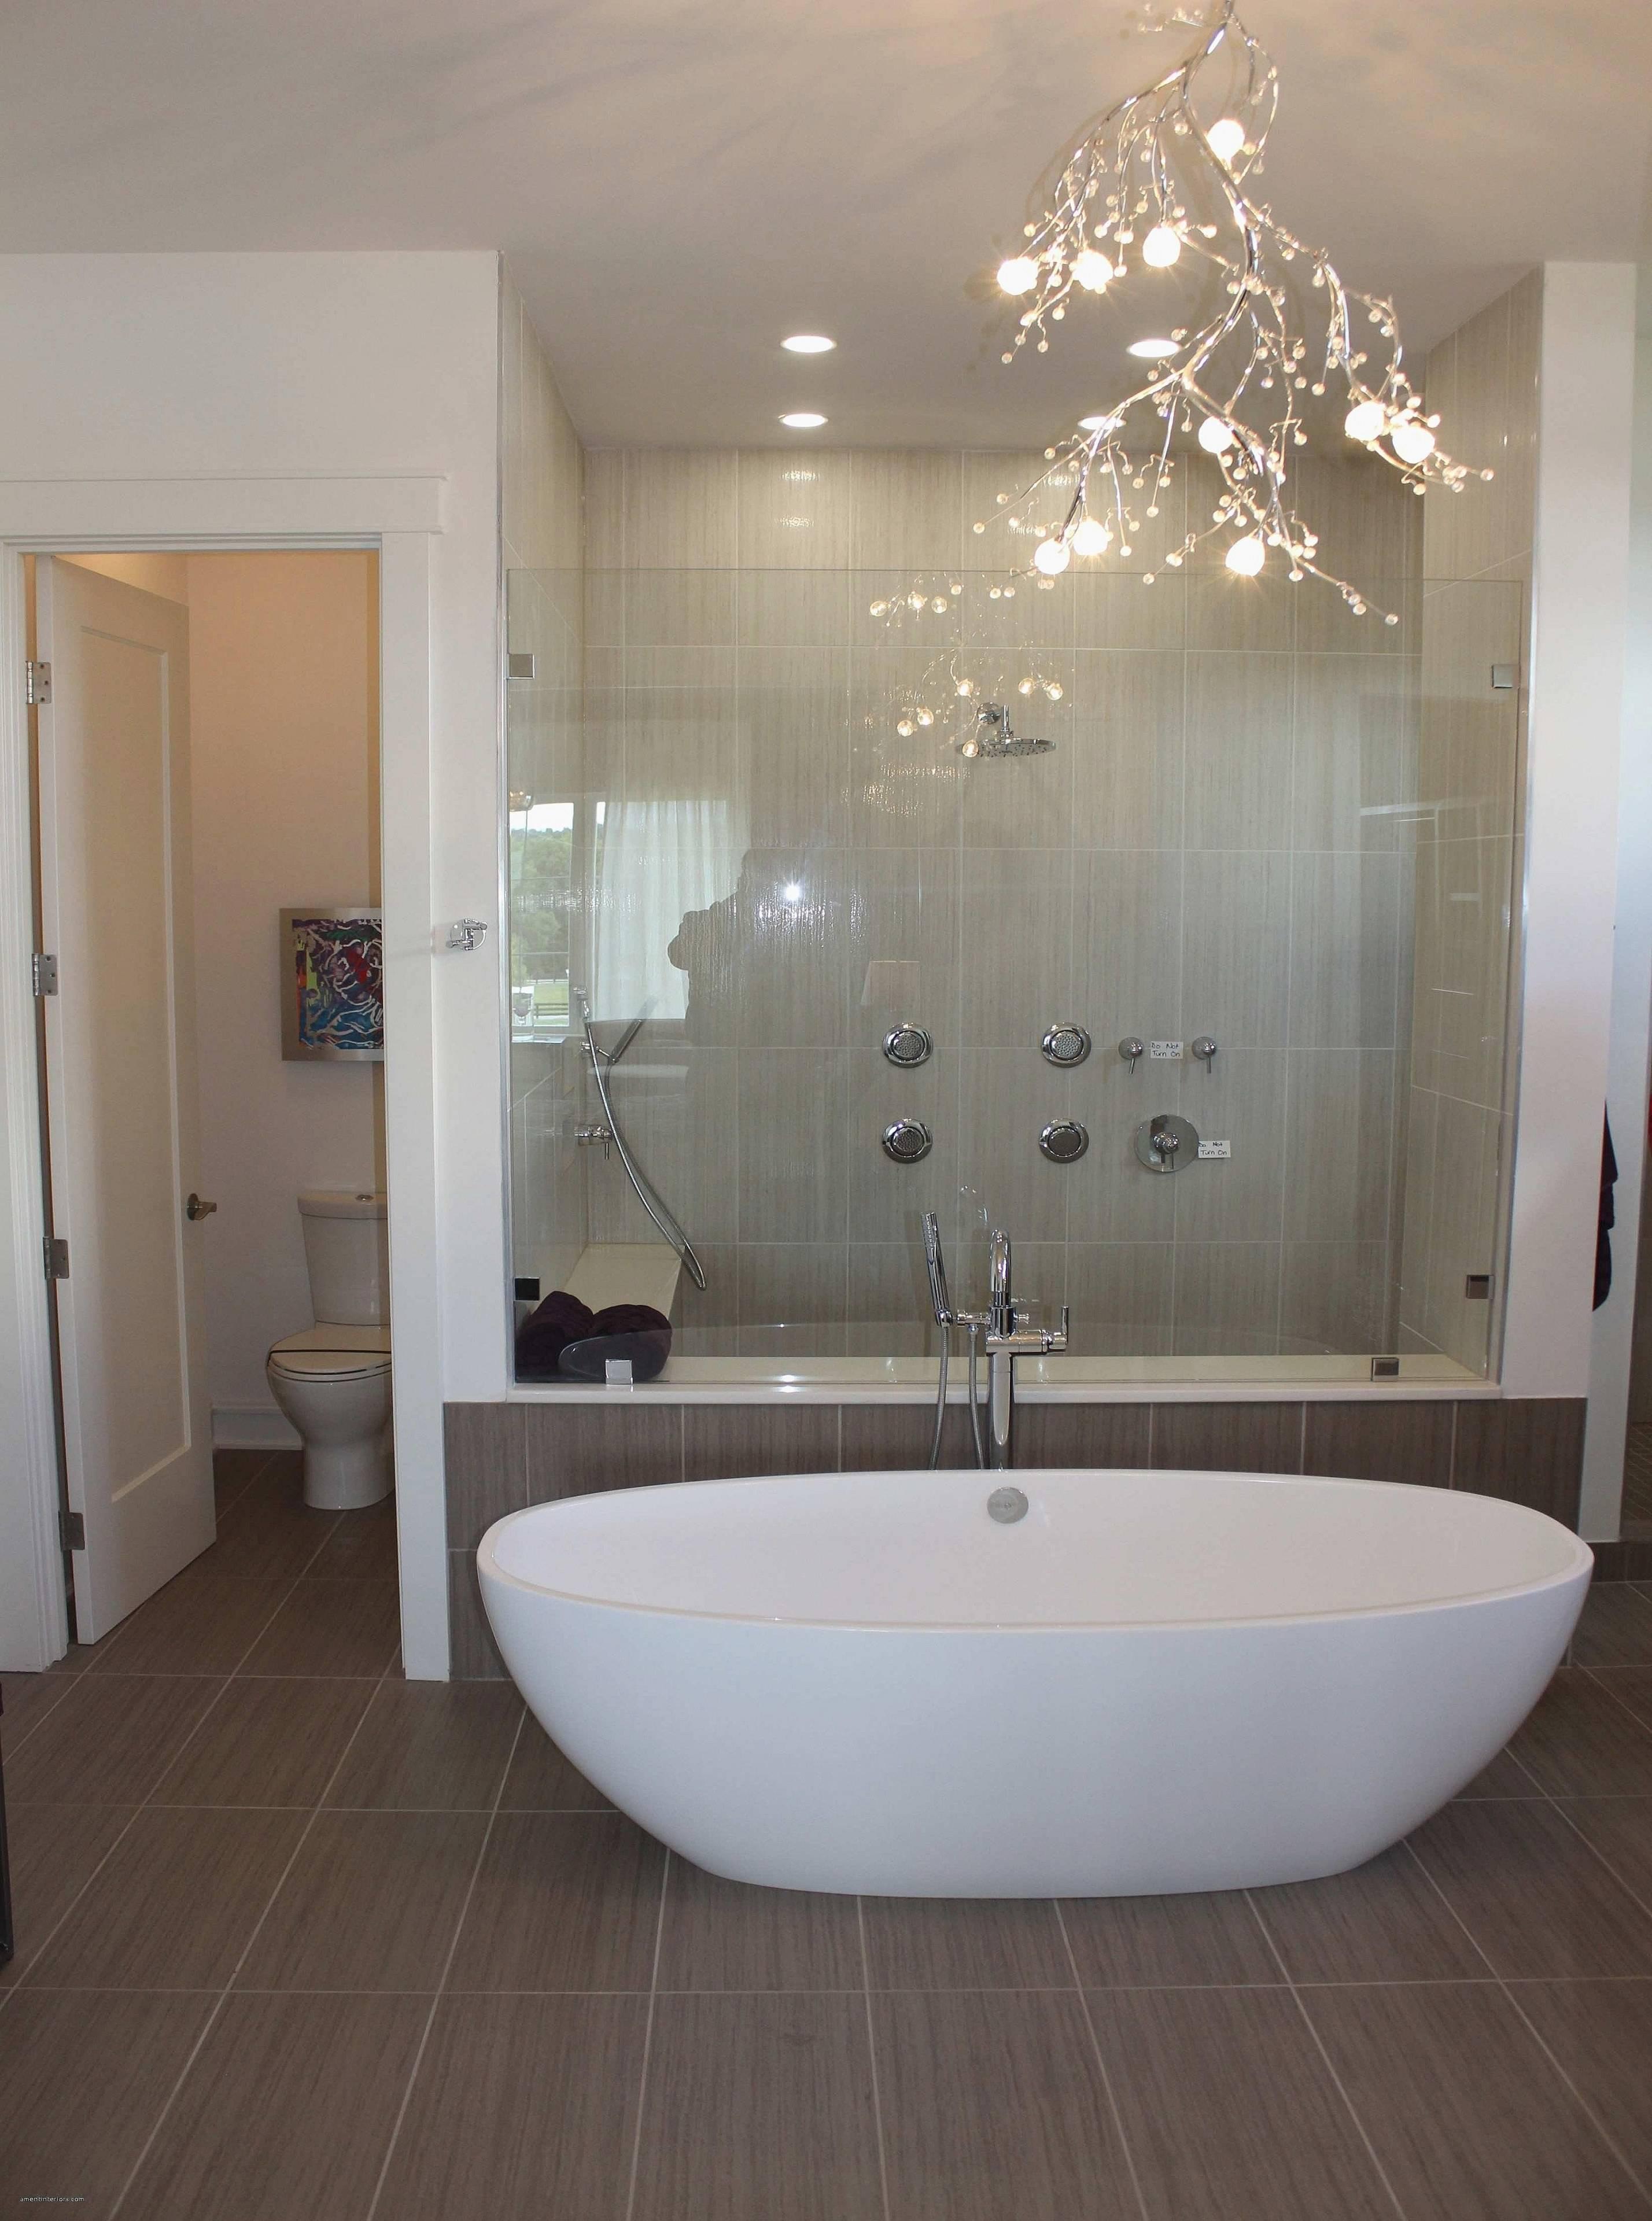 small bathroom design ideas useful guidelines decorate powder room decor solution of small bathroom design ideas